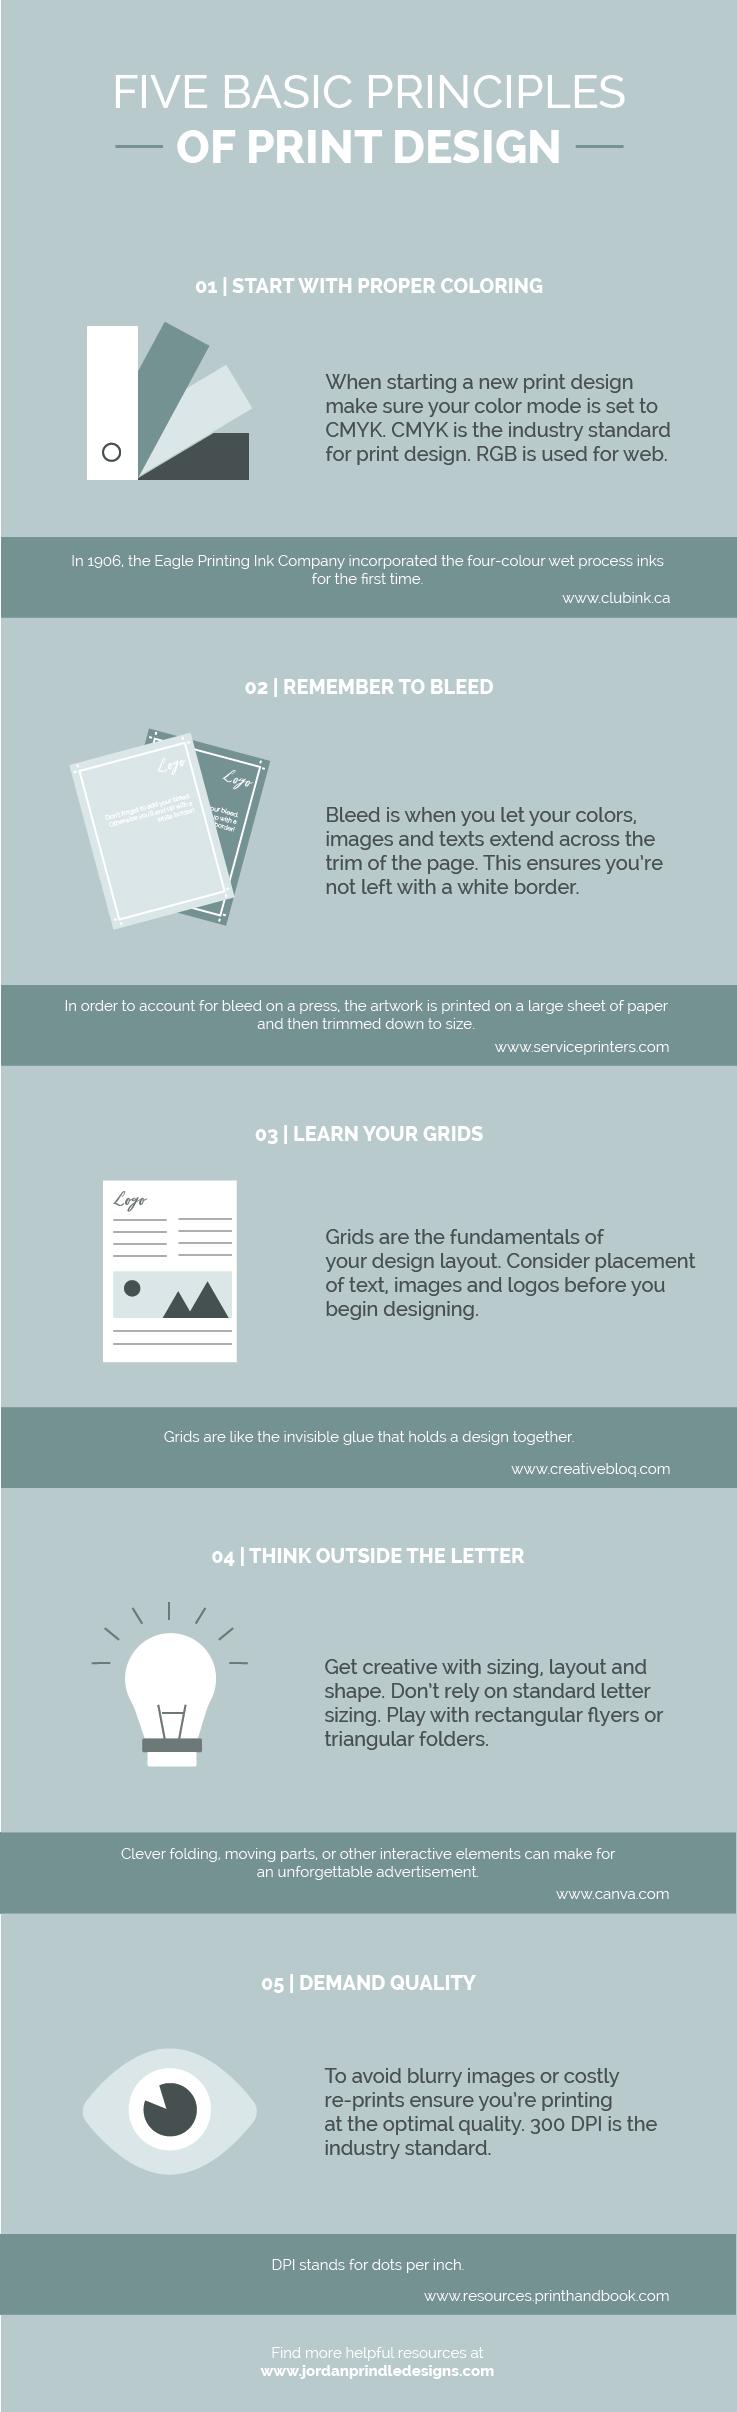 5 Basic Principles Of Print Design Jordan Prindle Designs Brand And Squarespace Designer For Entrepreneurs Creative Branding Branding Design Print Design